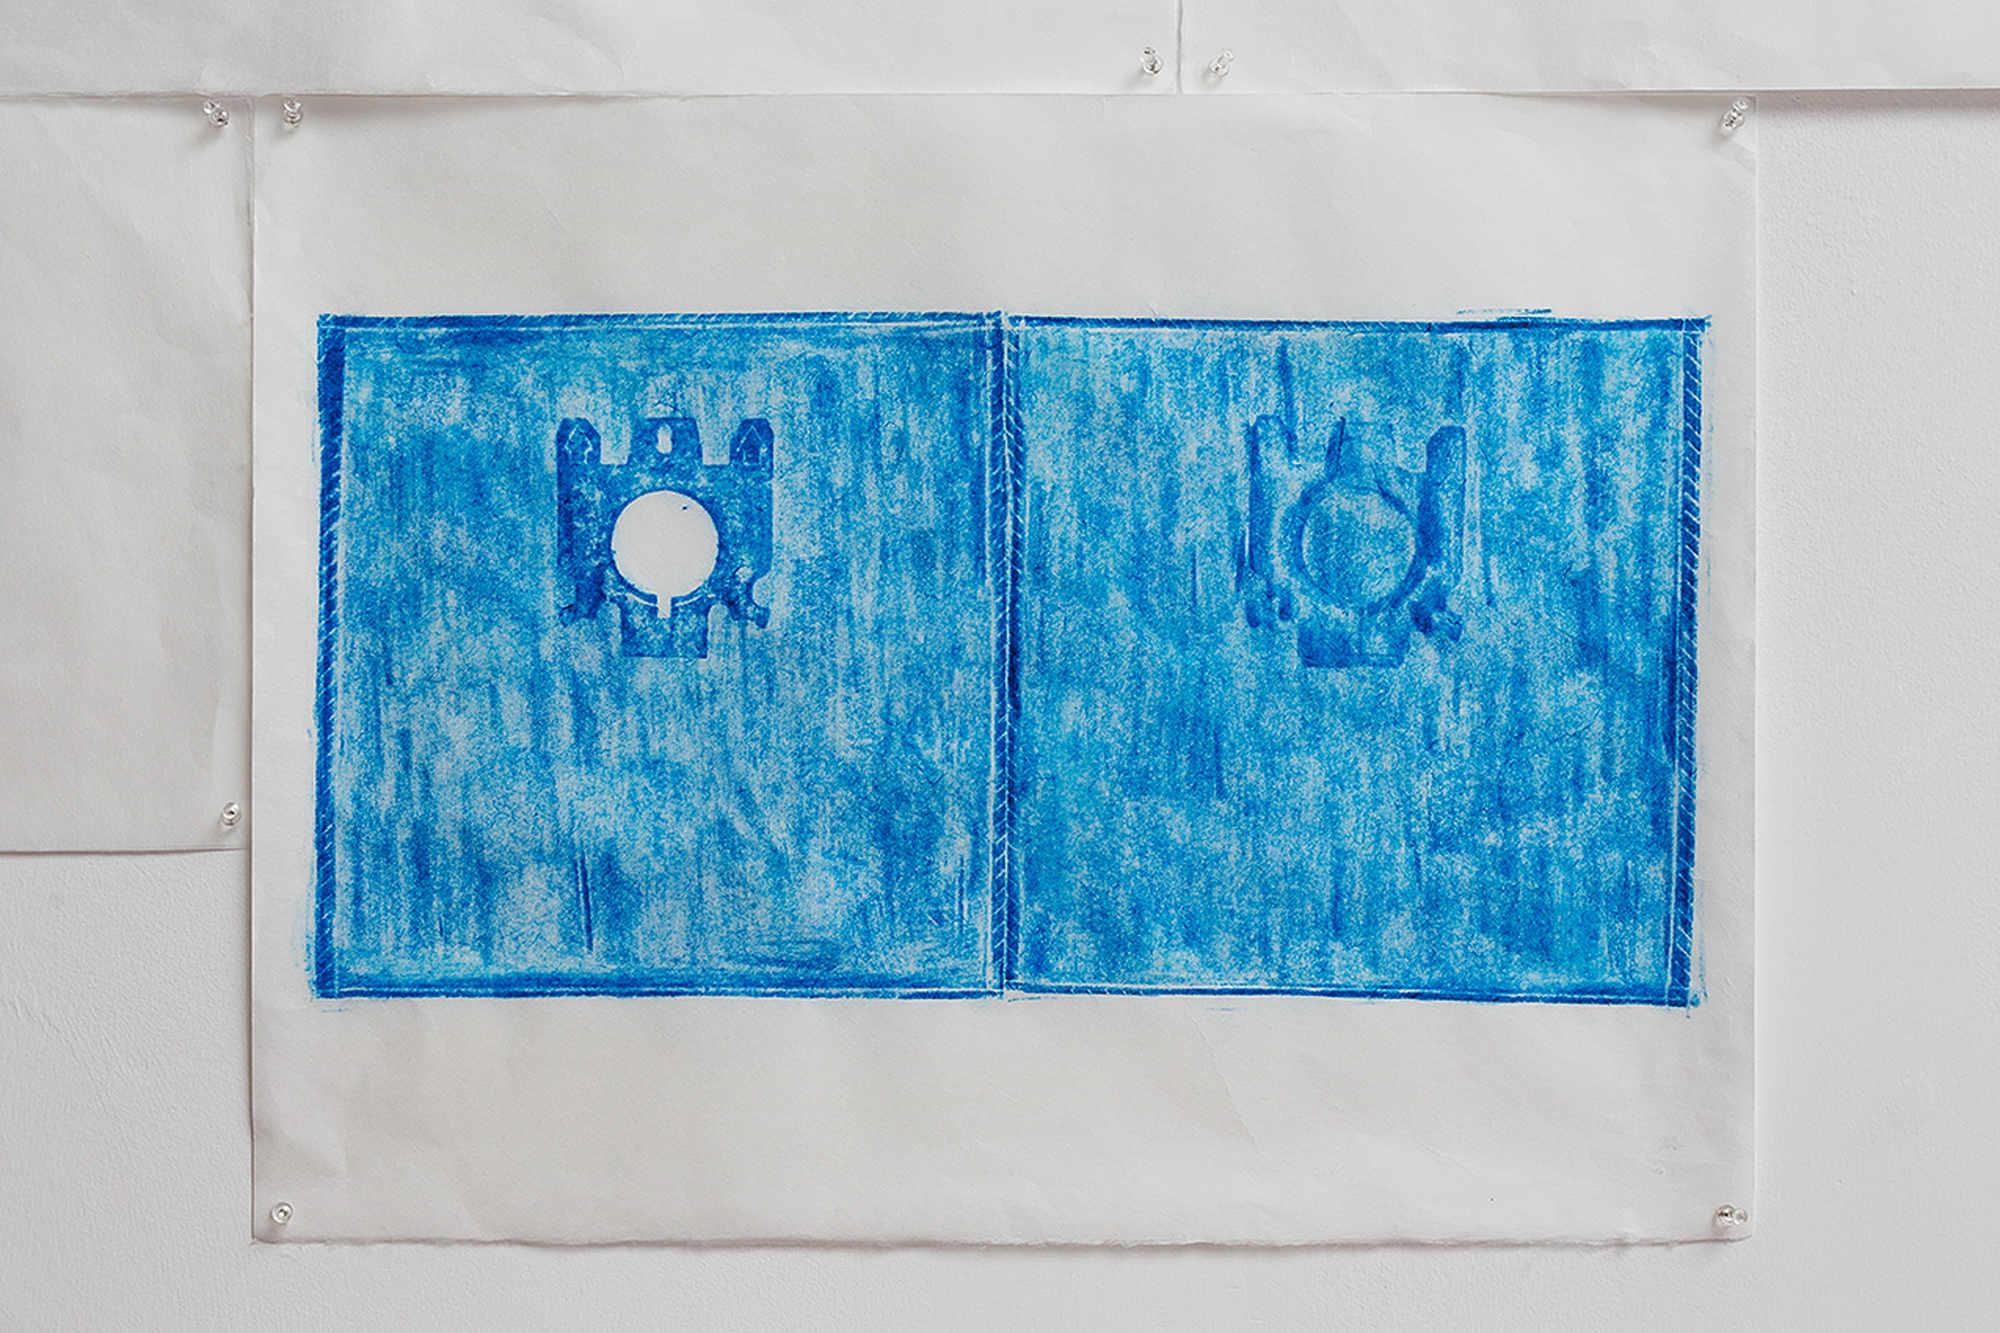 Jennifer Bornstein, Printed Matter, rubbing (encaustic and wax on Kozo paper), 49x64.5 cm, unique